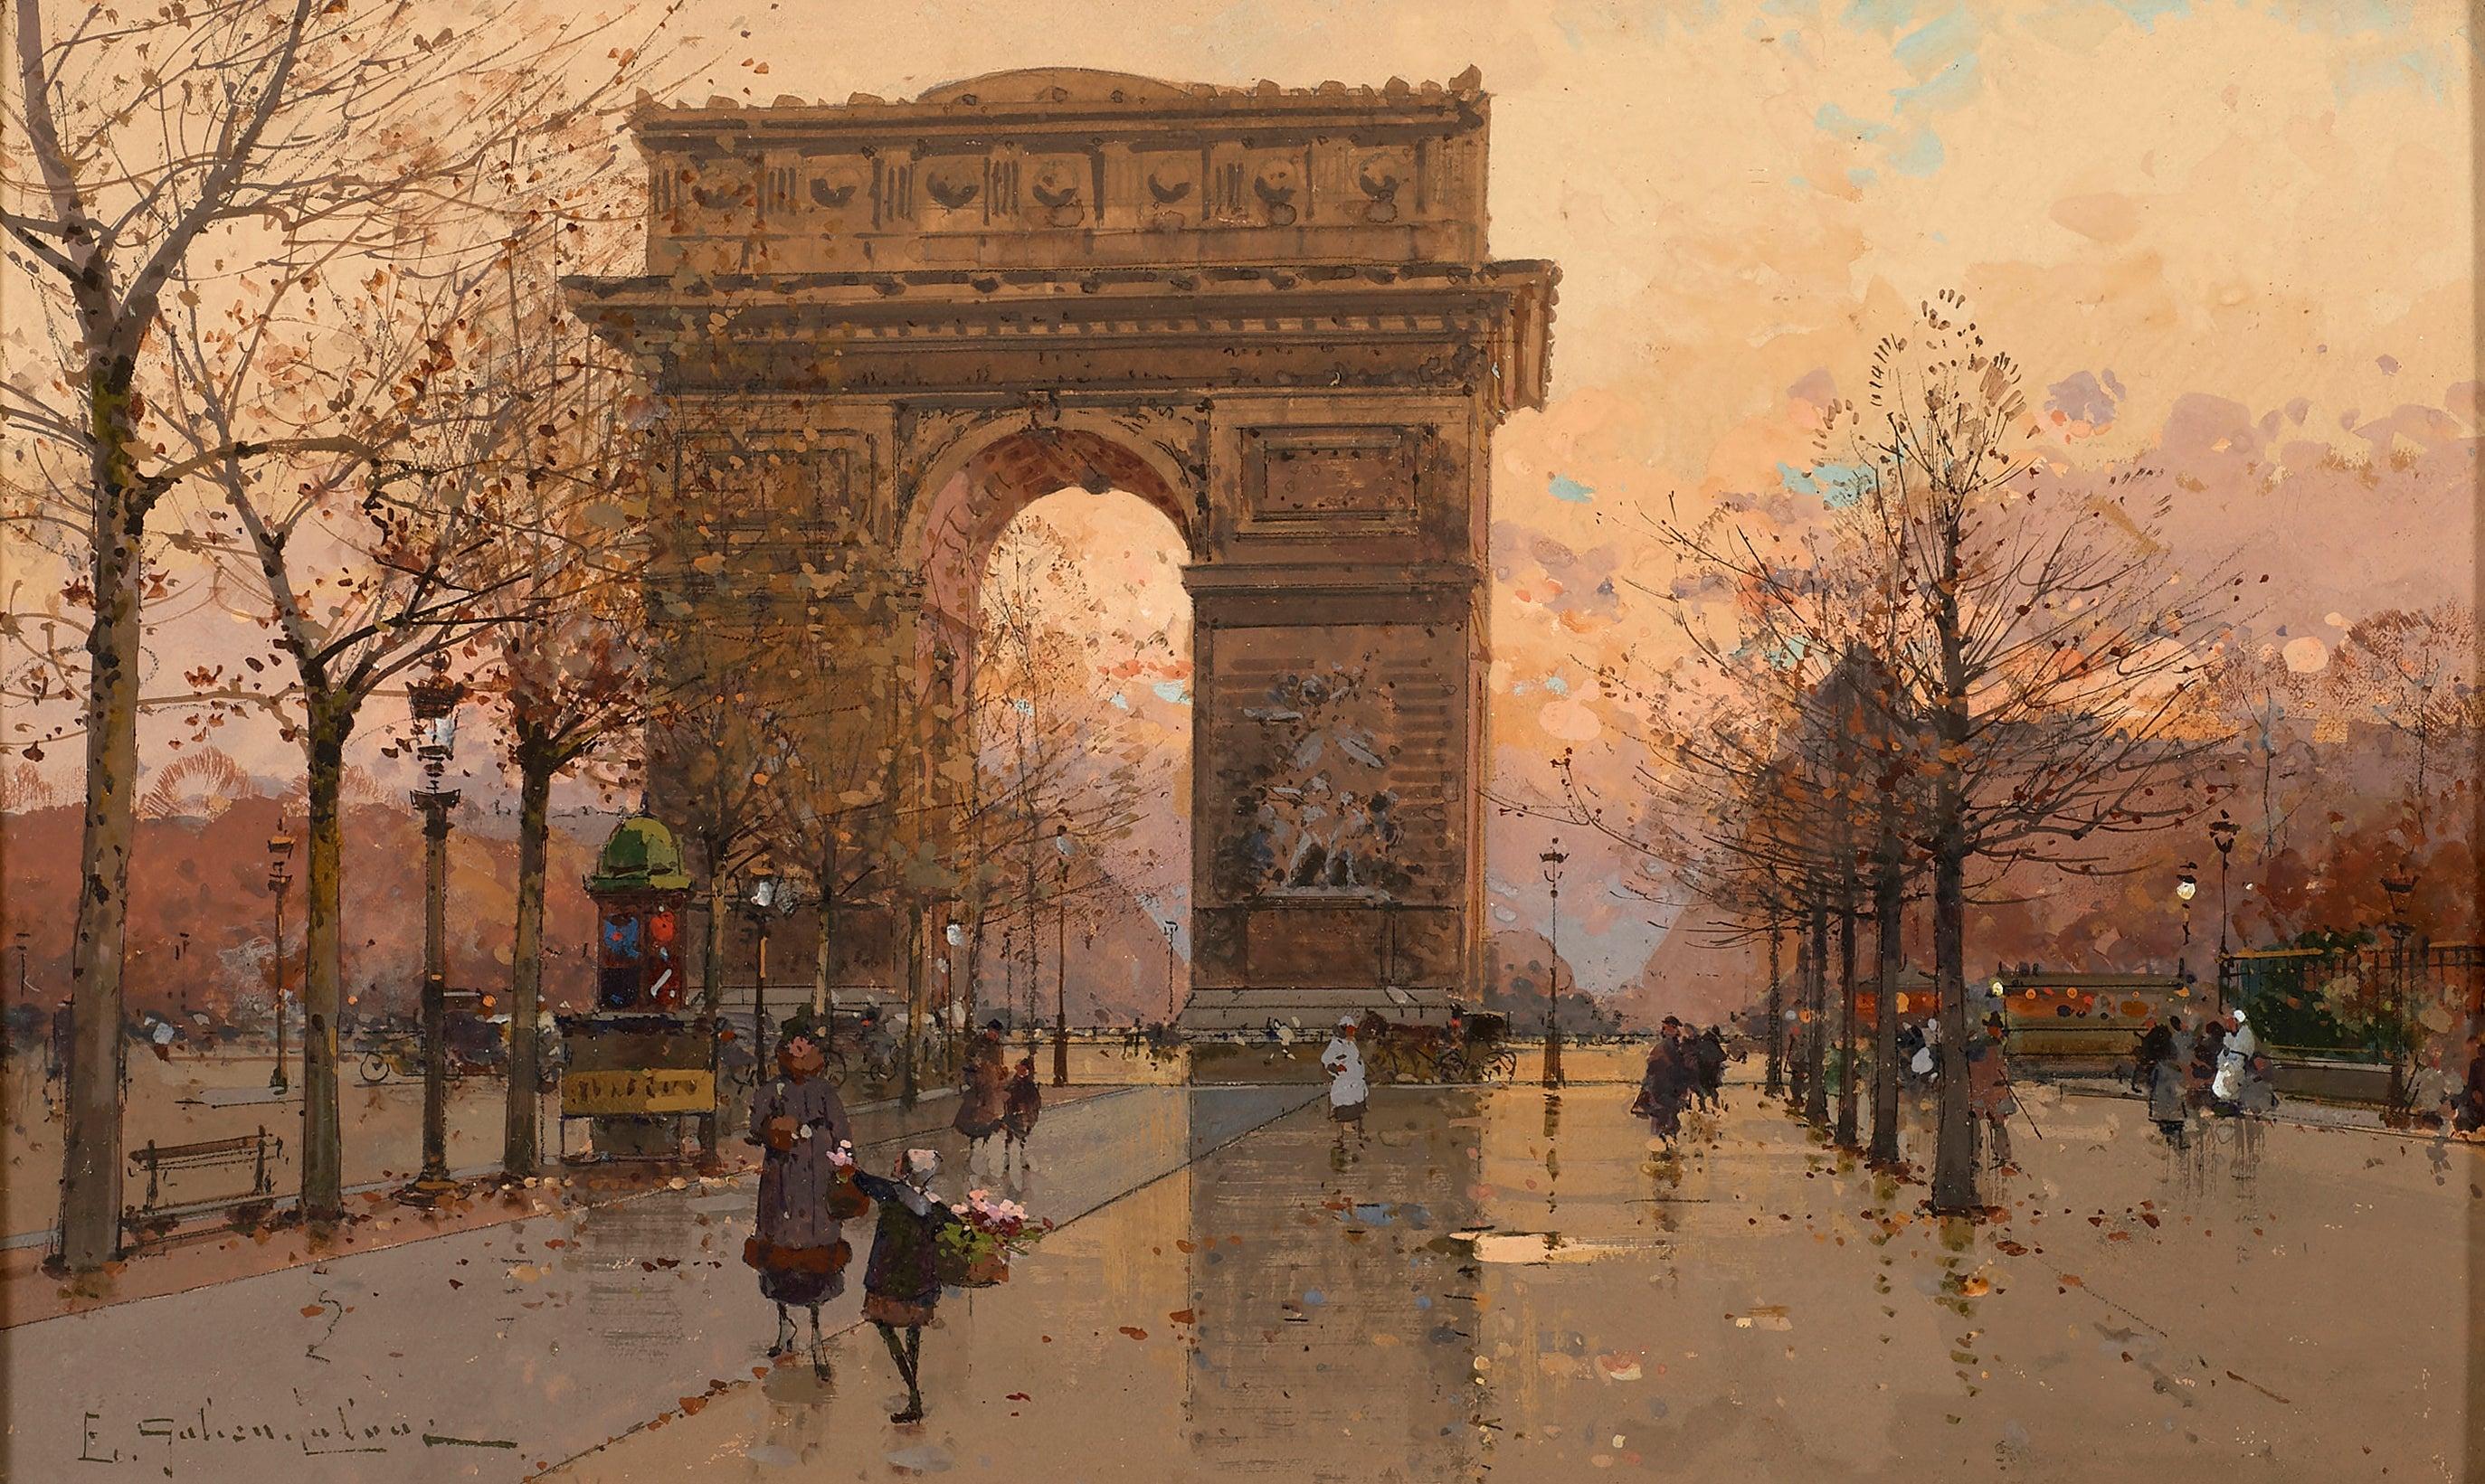 'Sunset at the Arc de Triomphe' Parisian street scene of Paris with figures